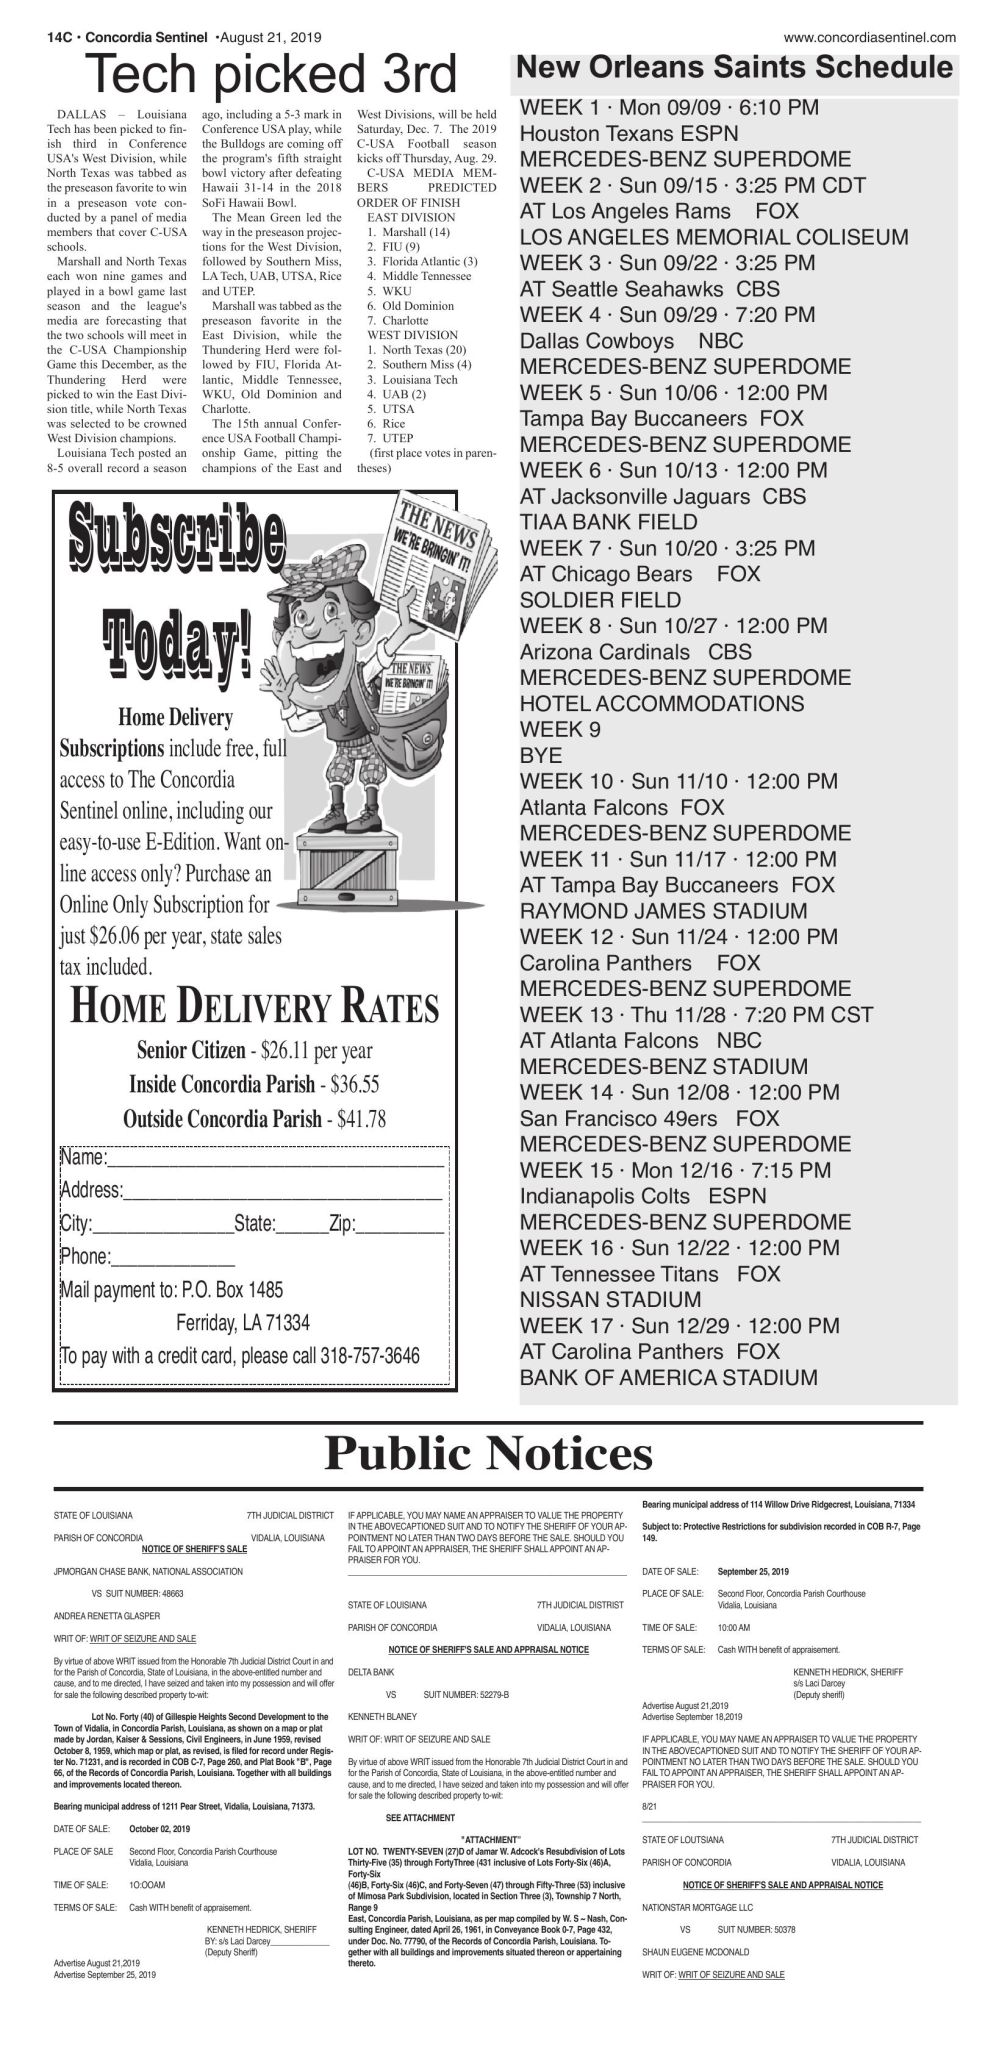 Public notices - August 21, 2019